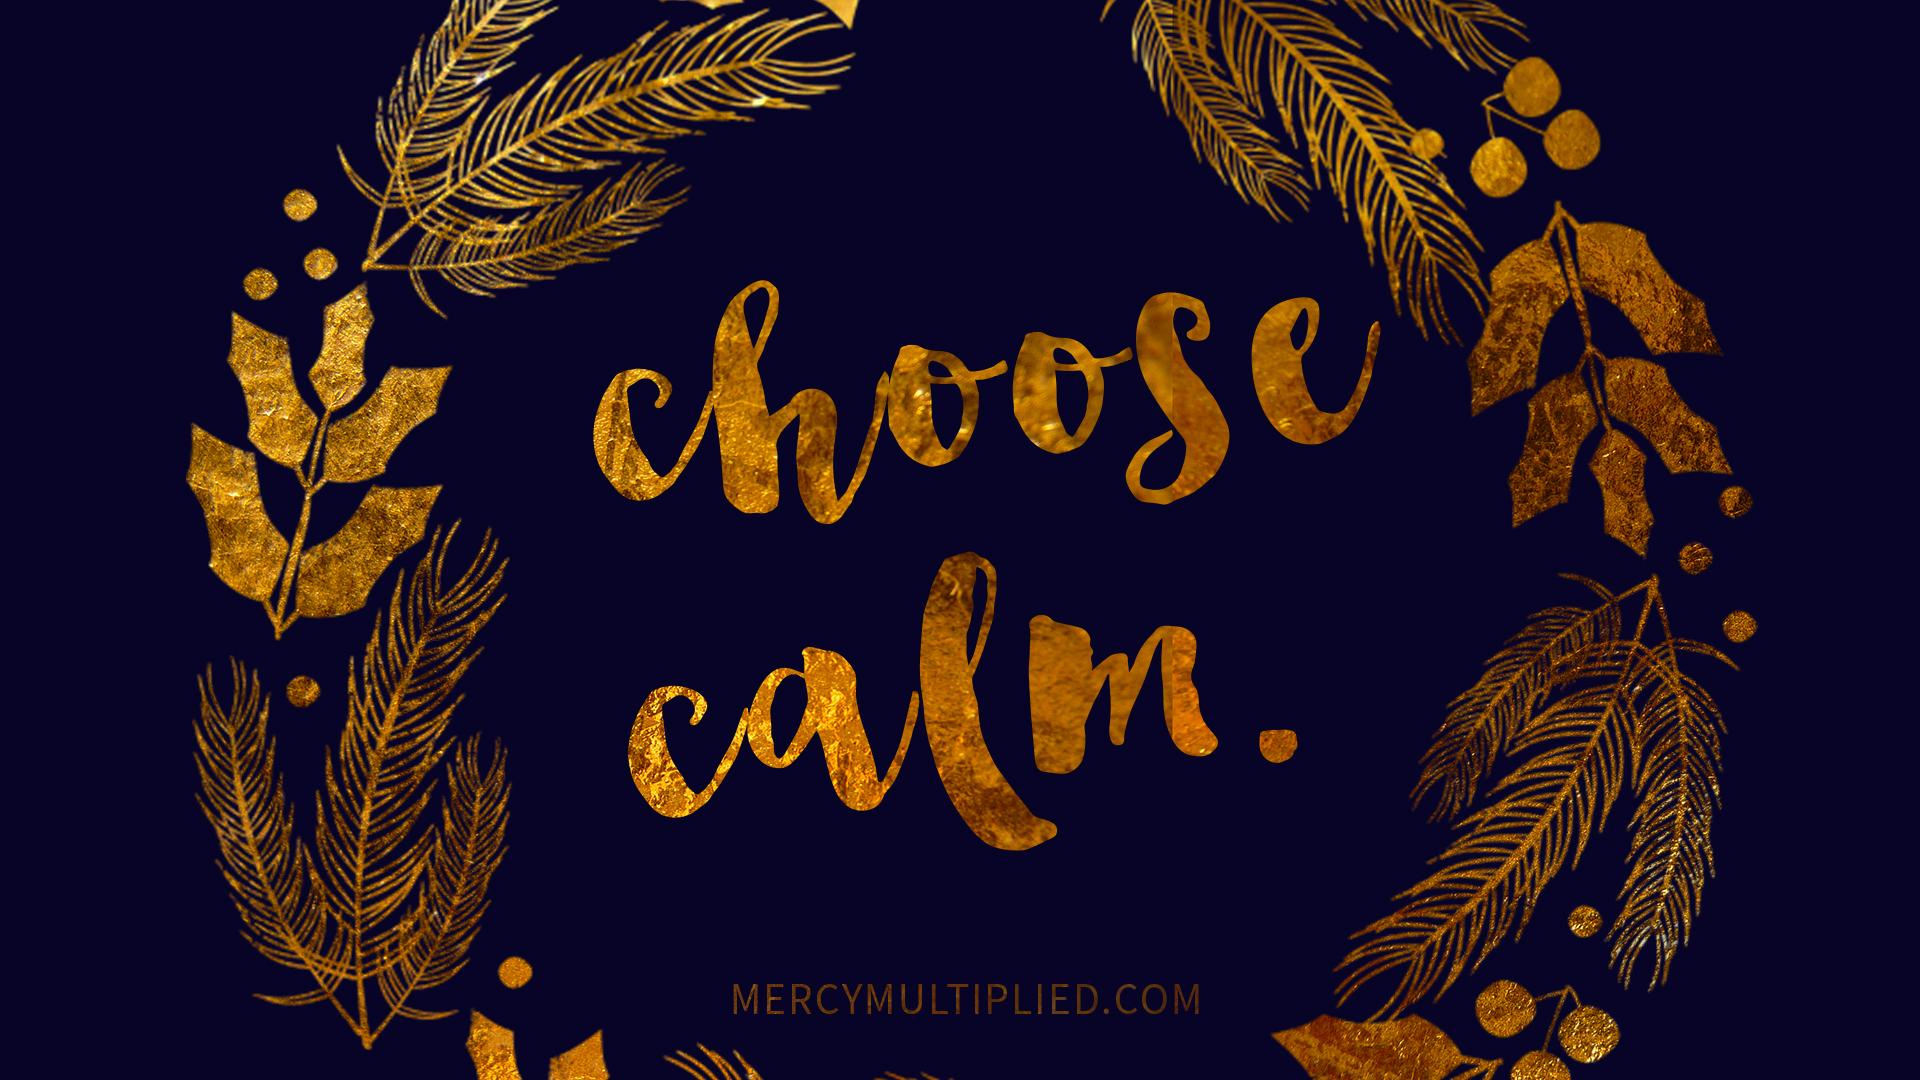 Choose Calm Desktop Download | mercymultiplied.com